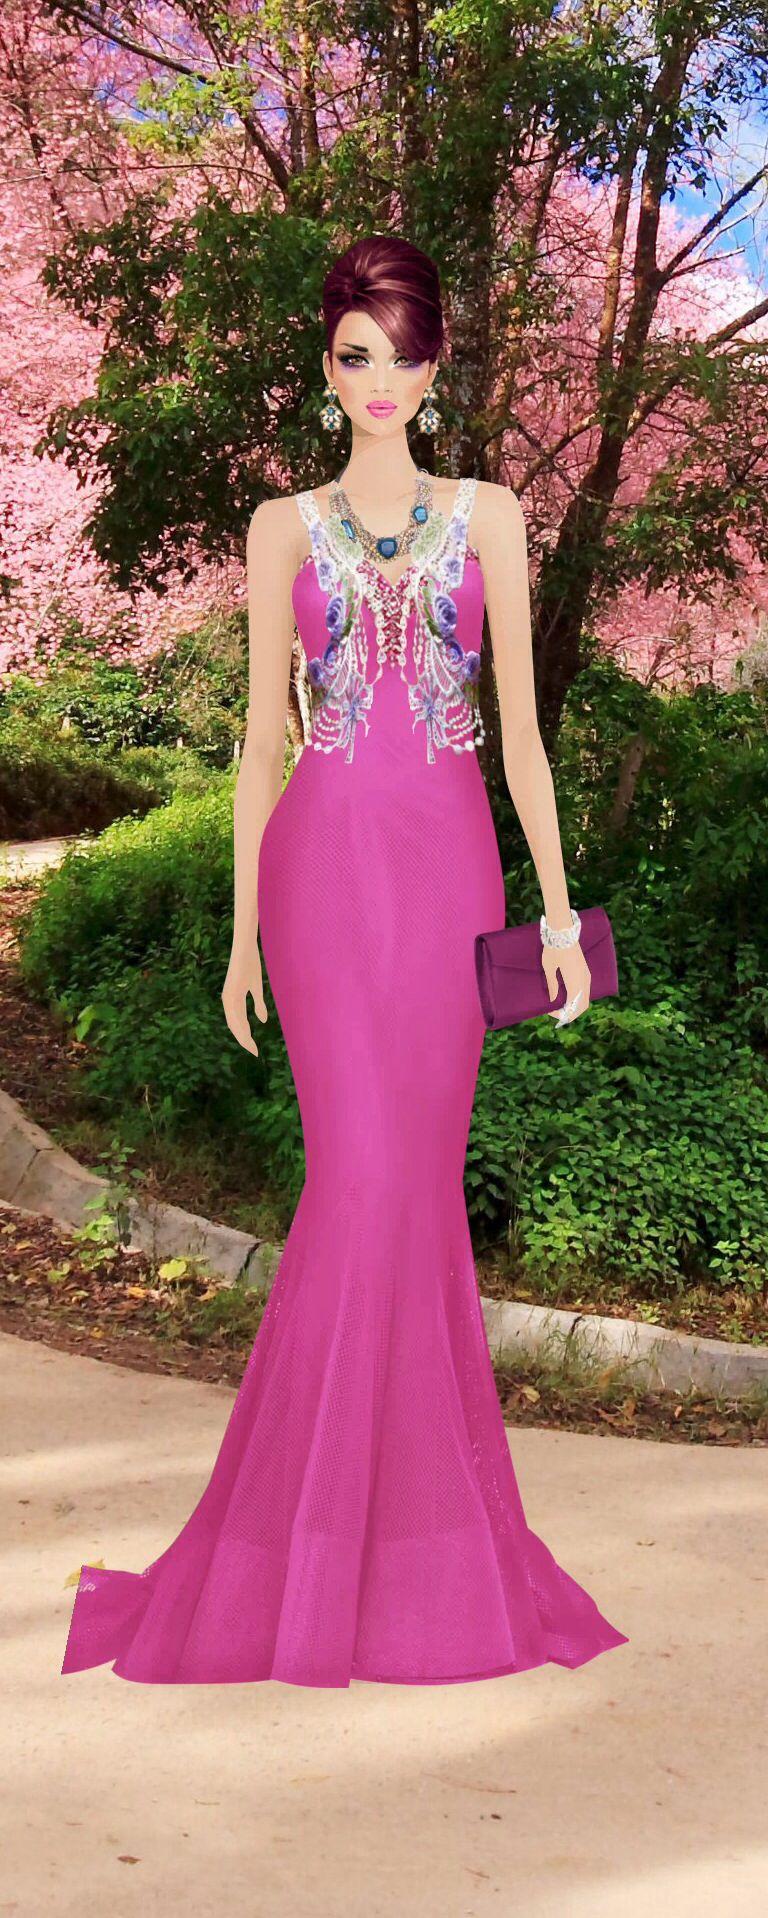 Pin de Carmen hb en Modelos - Covet Fashion y otras | Pinterest ...